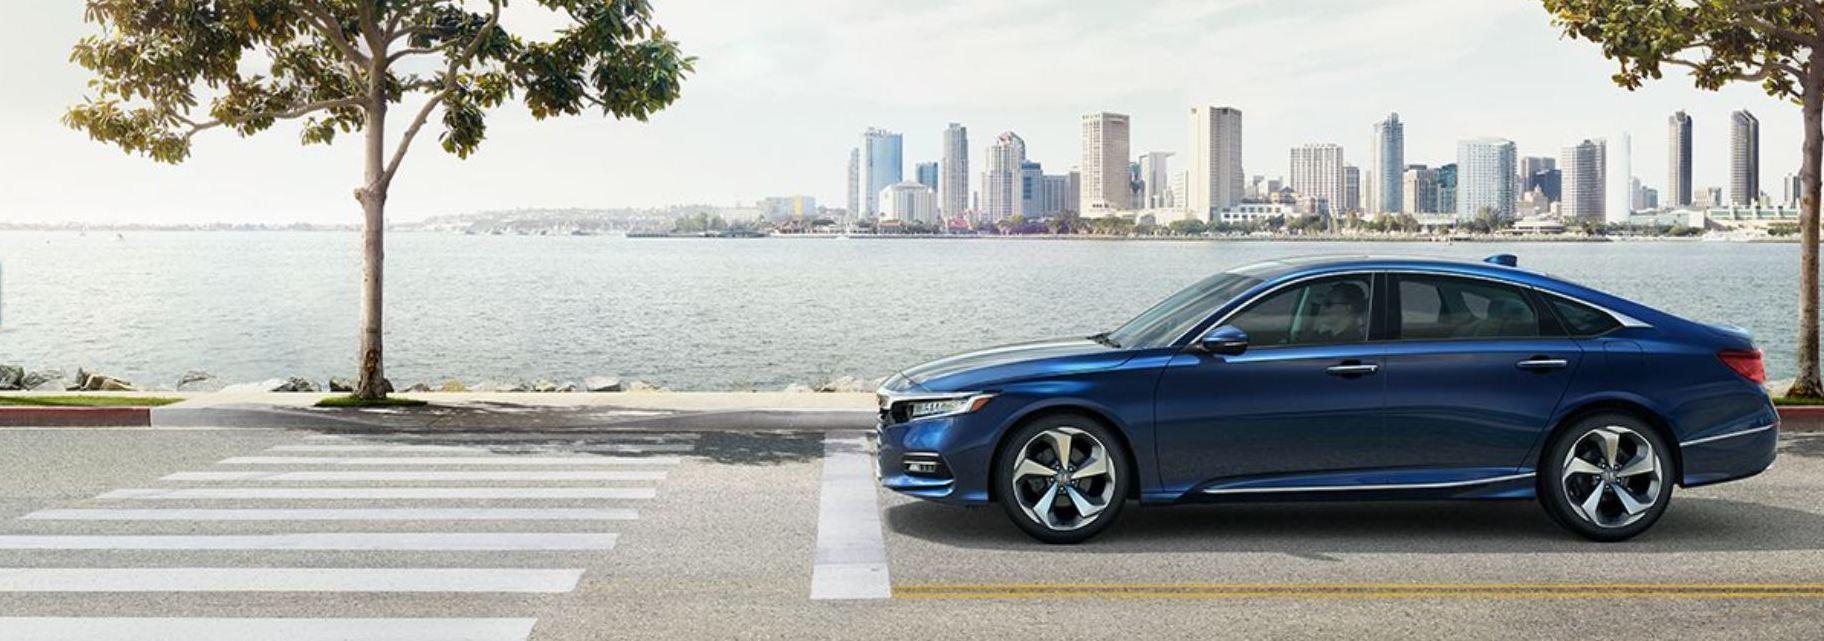 2020 Honda Accord for Sale near Bethesda, MD